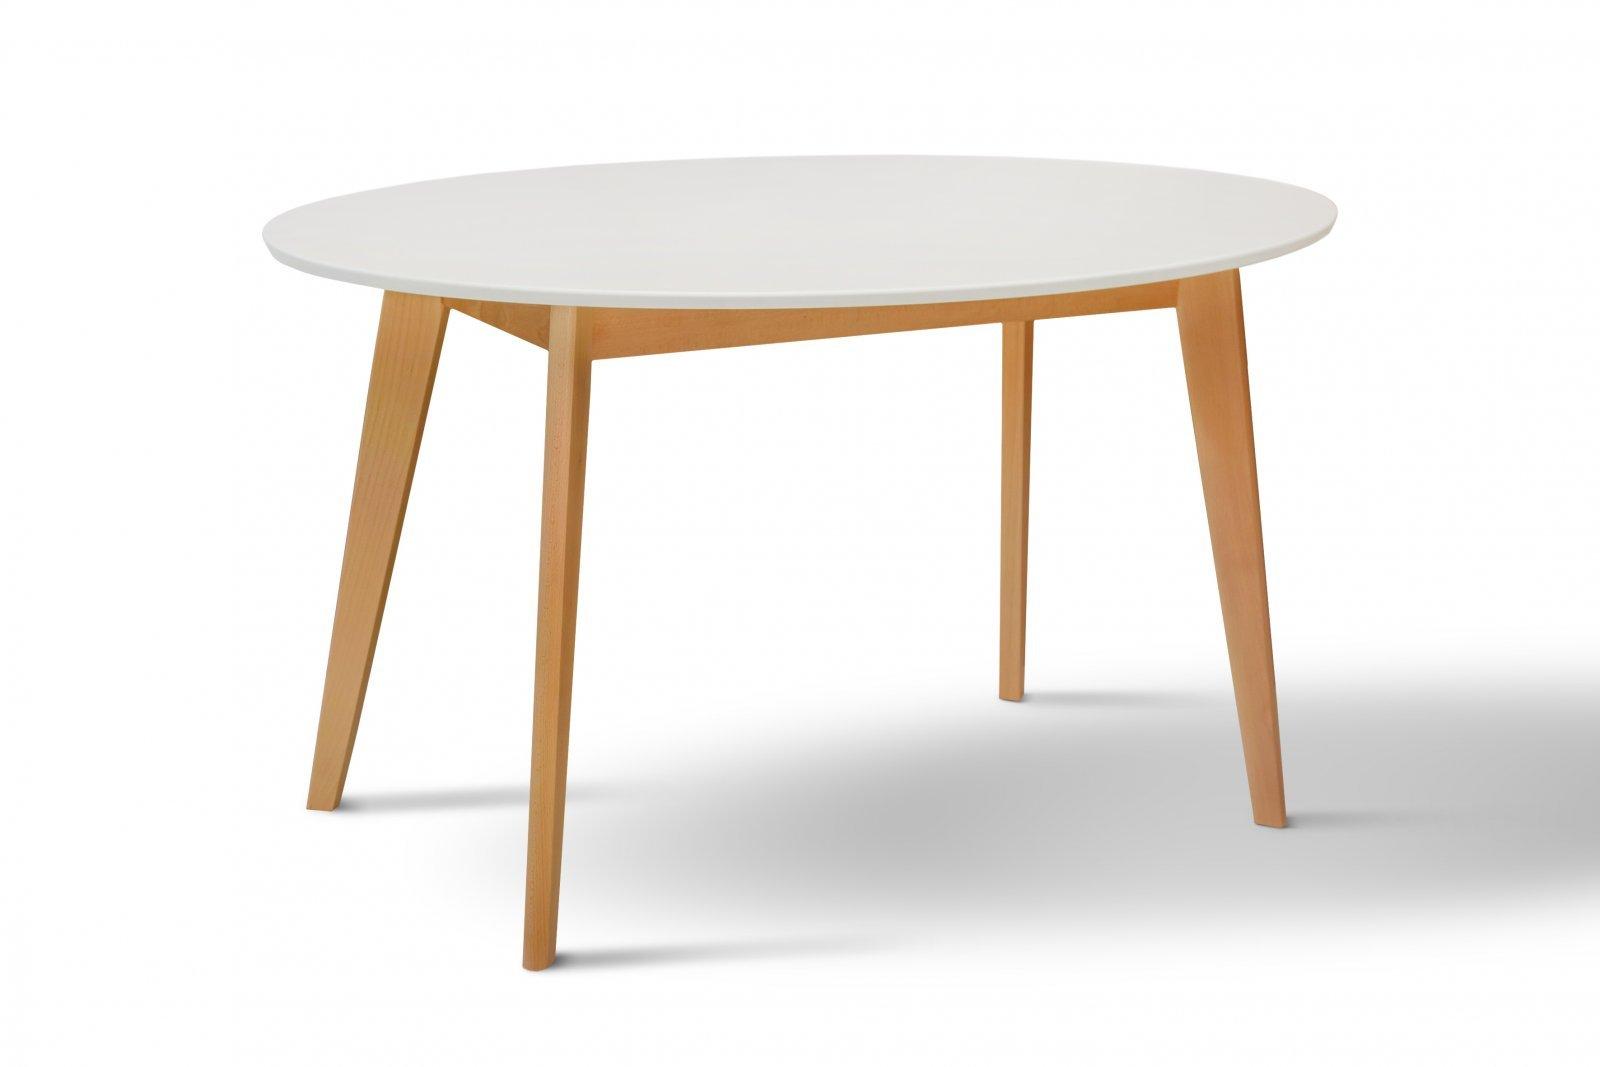 Фото - Стол Космо и стулья Модерн